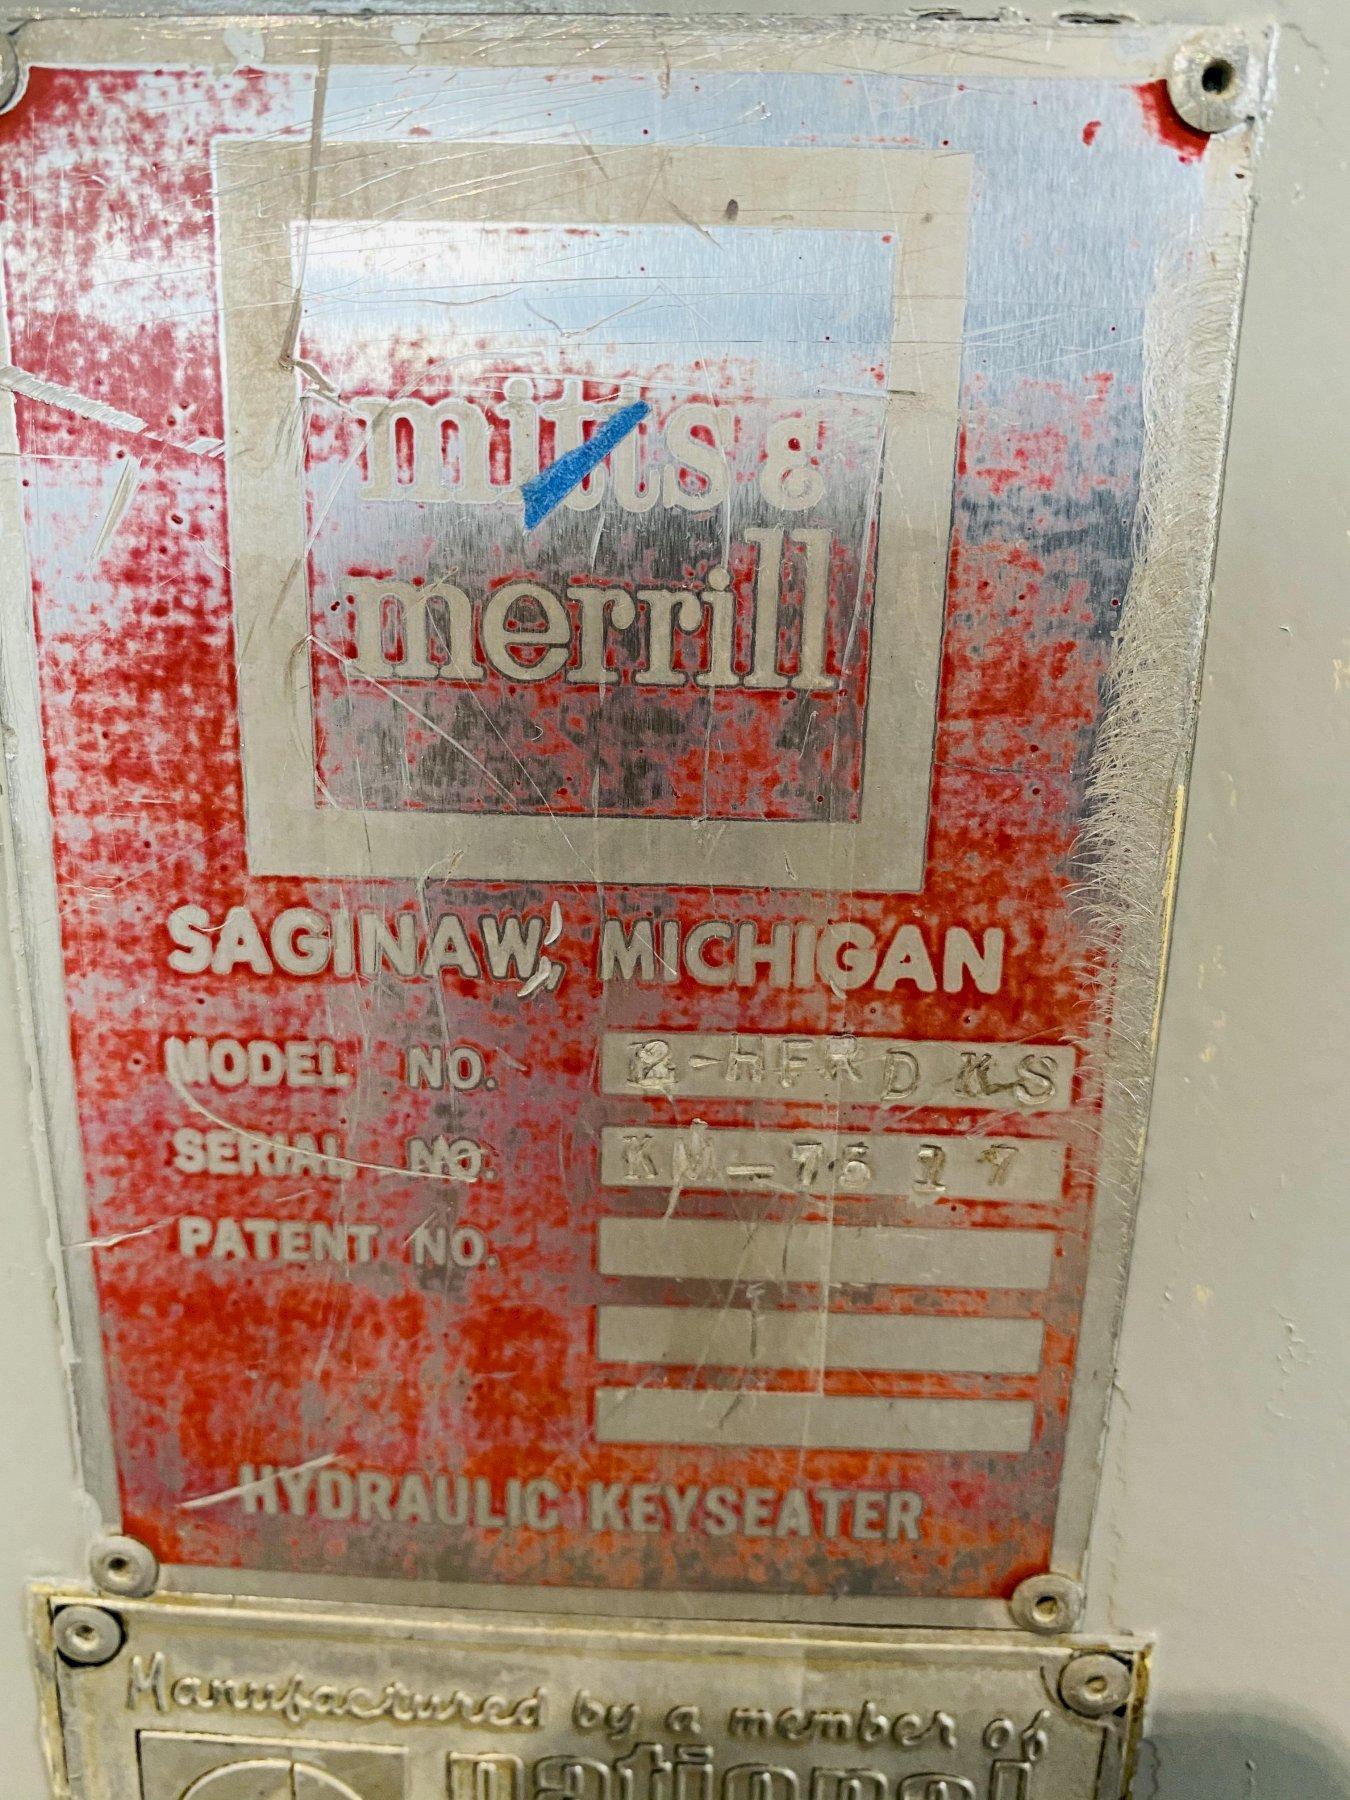 "1.25"" X 12"" MITTS & MERRILL MODEL # 2-HFRD-KS HYDRAULIC KEYSEATER. STOCK # 1262620"